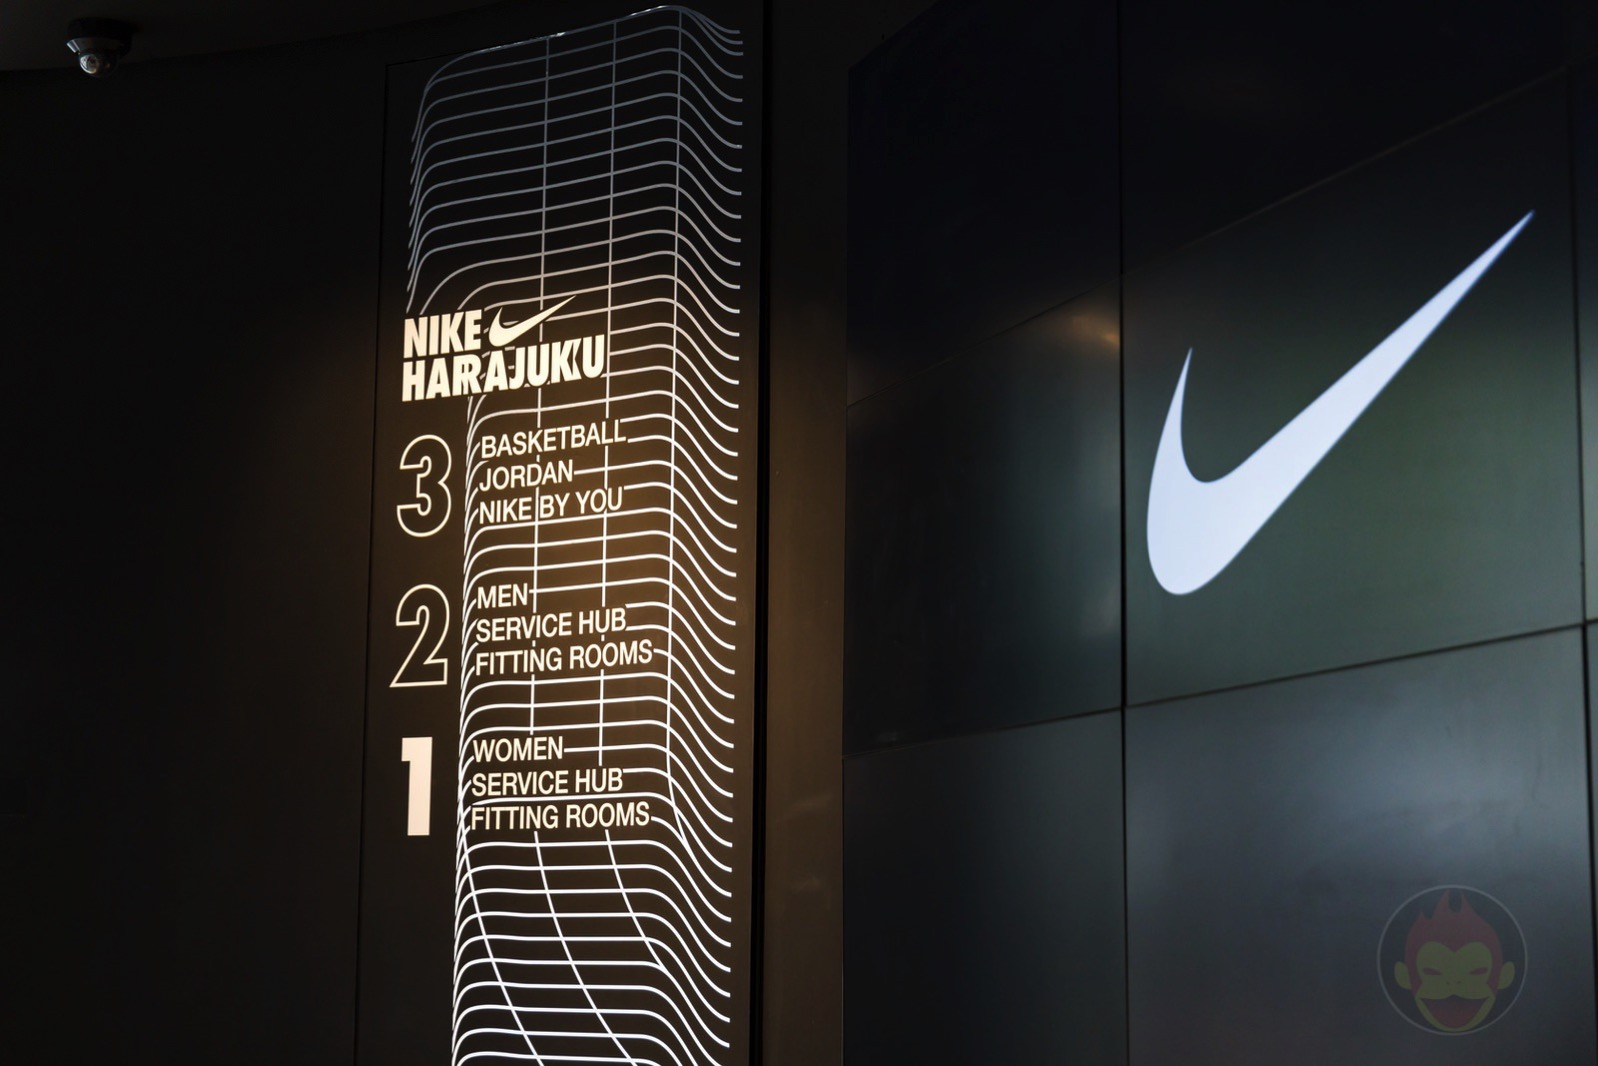 Nike Harajuku Renewal 07